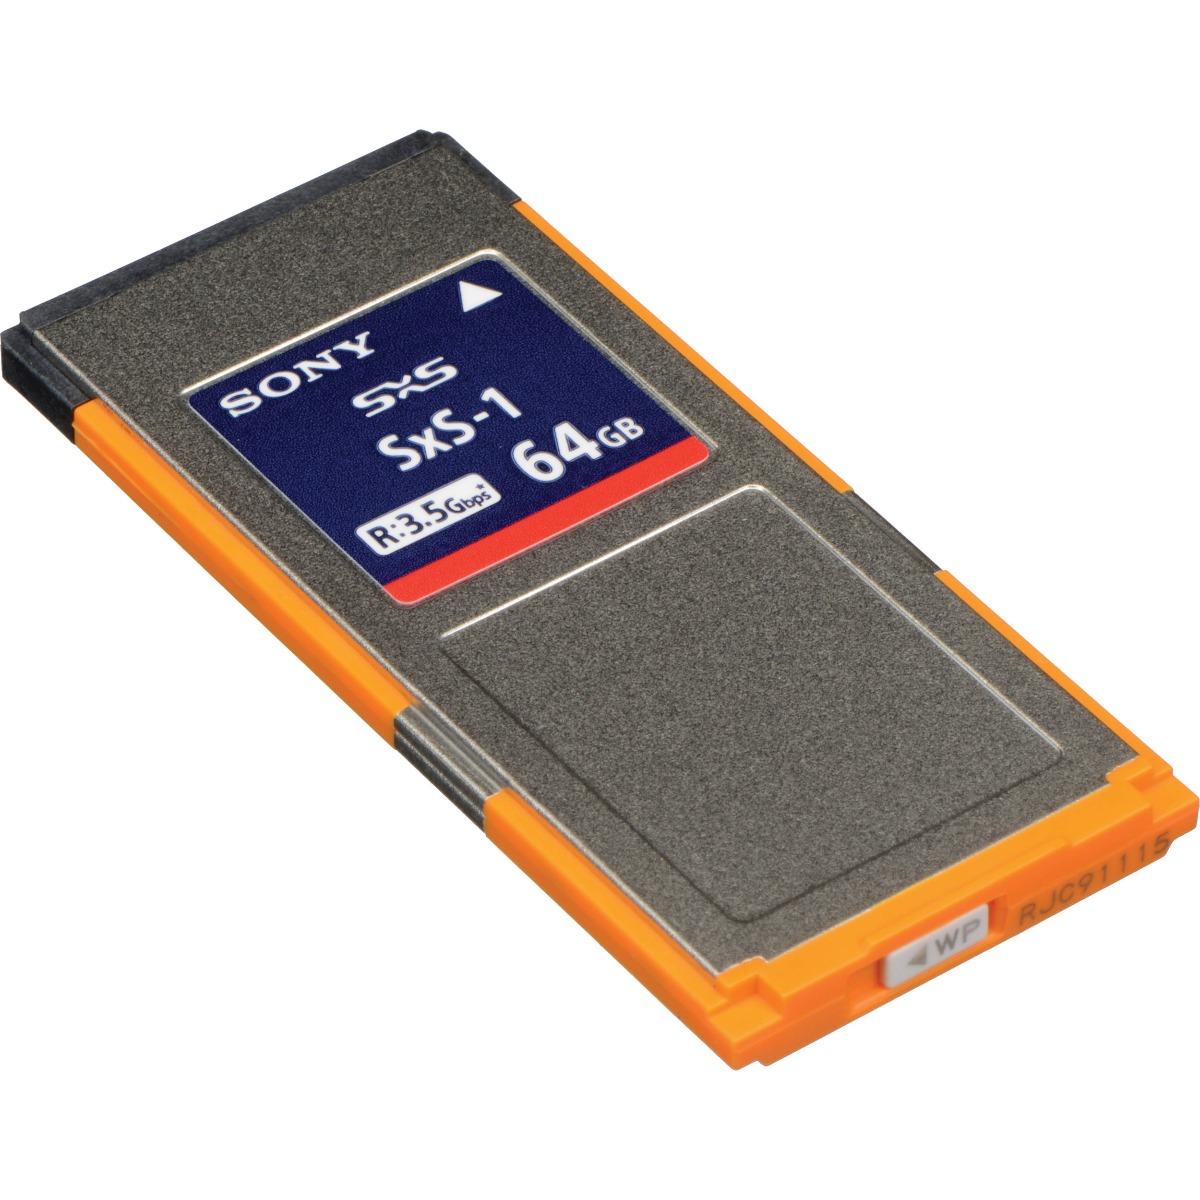 SONY SBS-64G1C 64GB SXS-1 MEMORY CARD